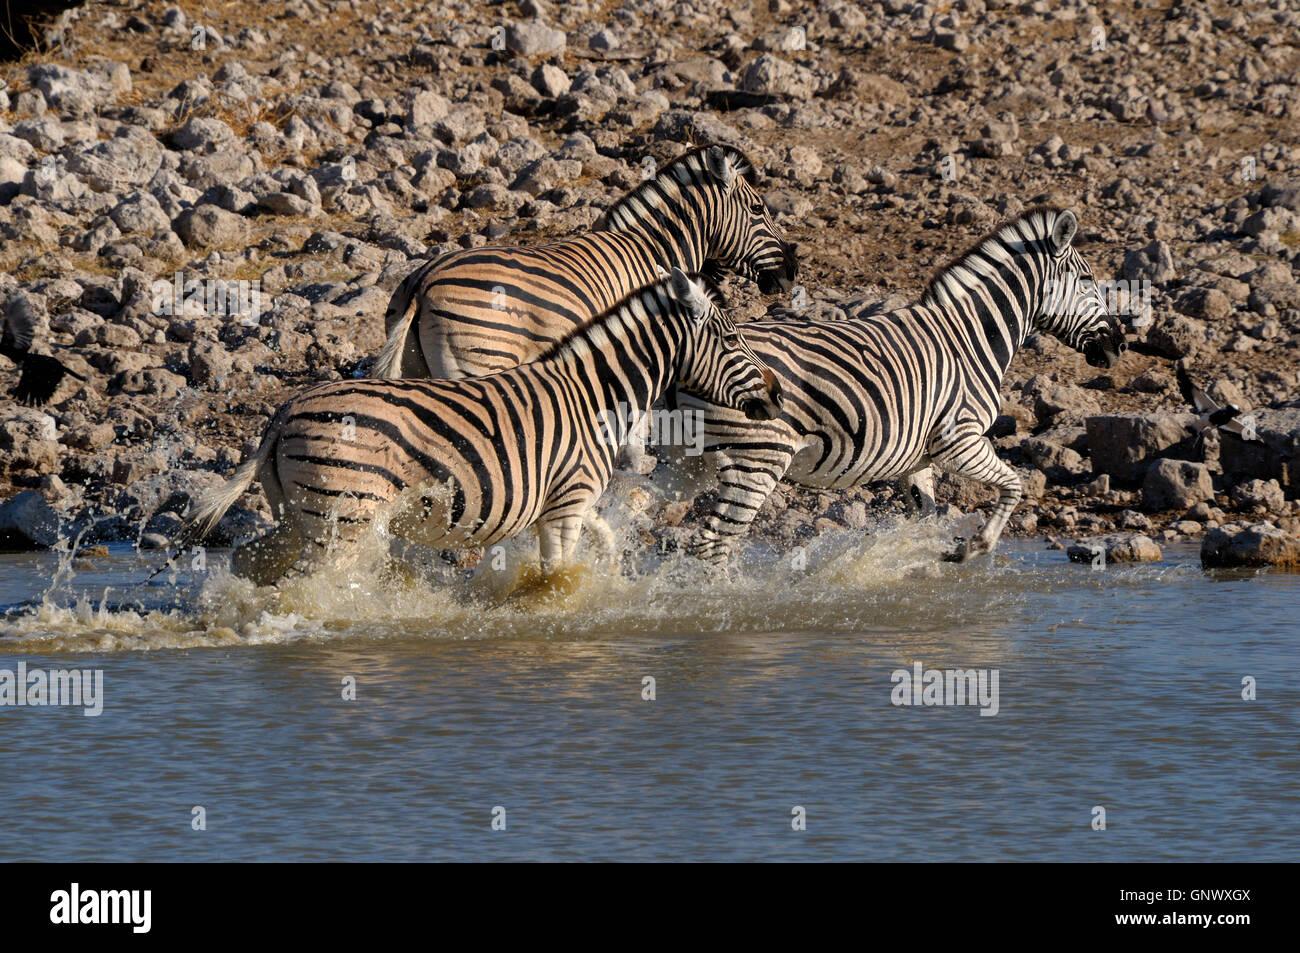 Zebra stampede, Okaukeujo waterhole - Stock Image